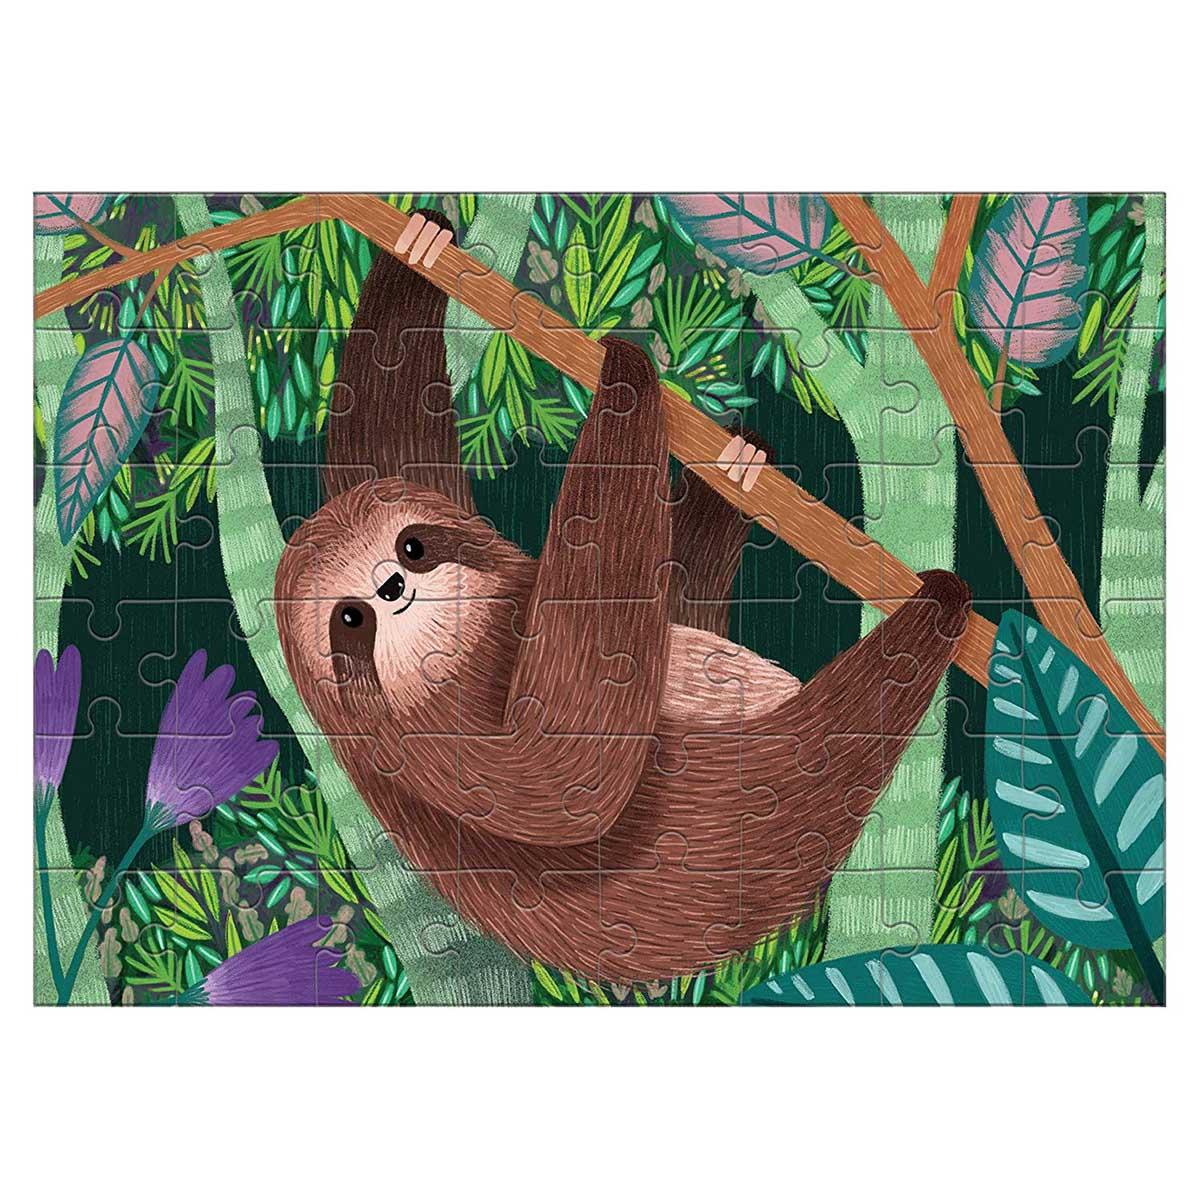 Three-Toed Sloth (Mini) Animals Jigsaw Puzzle